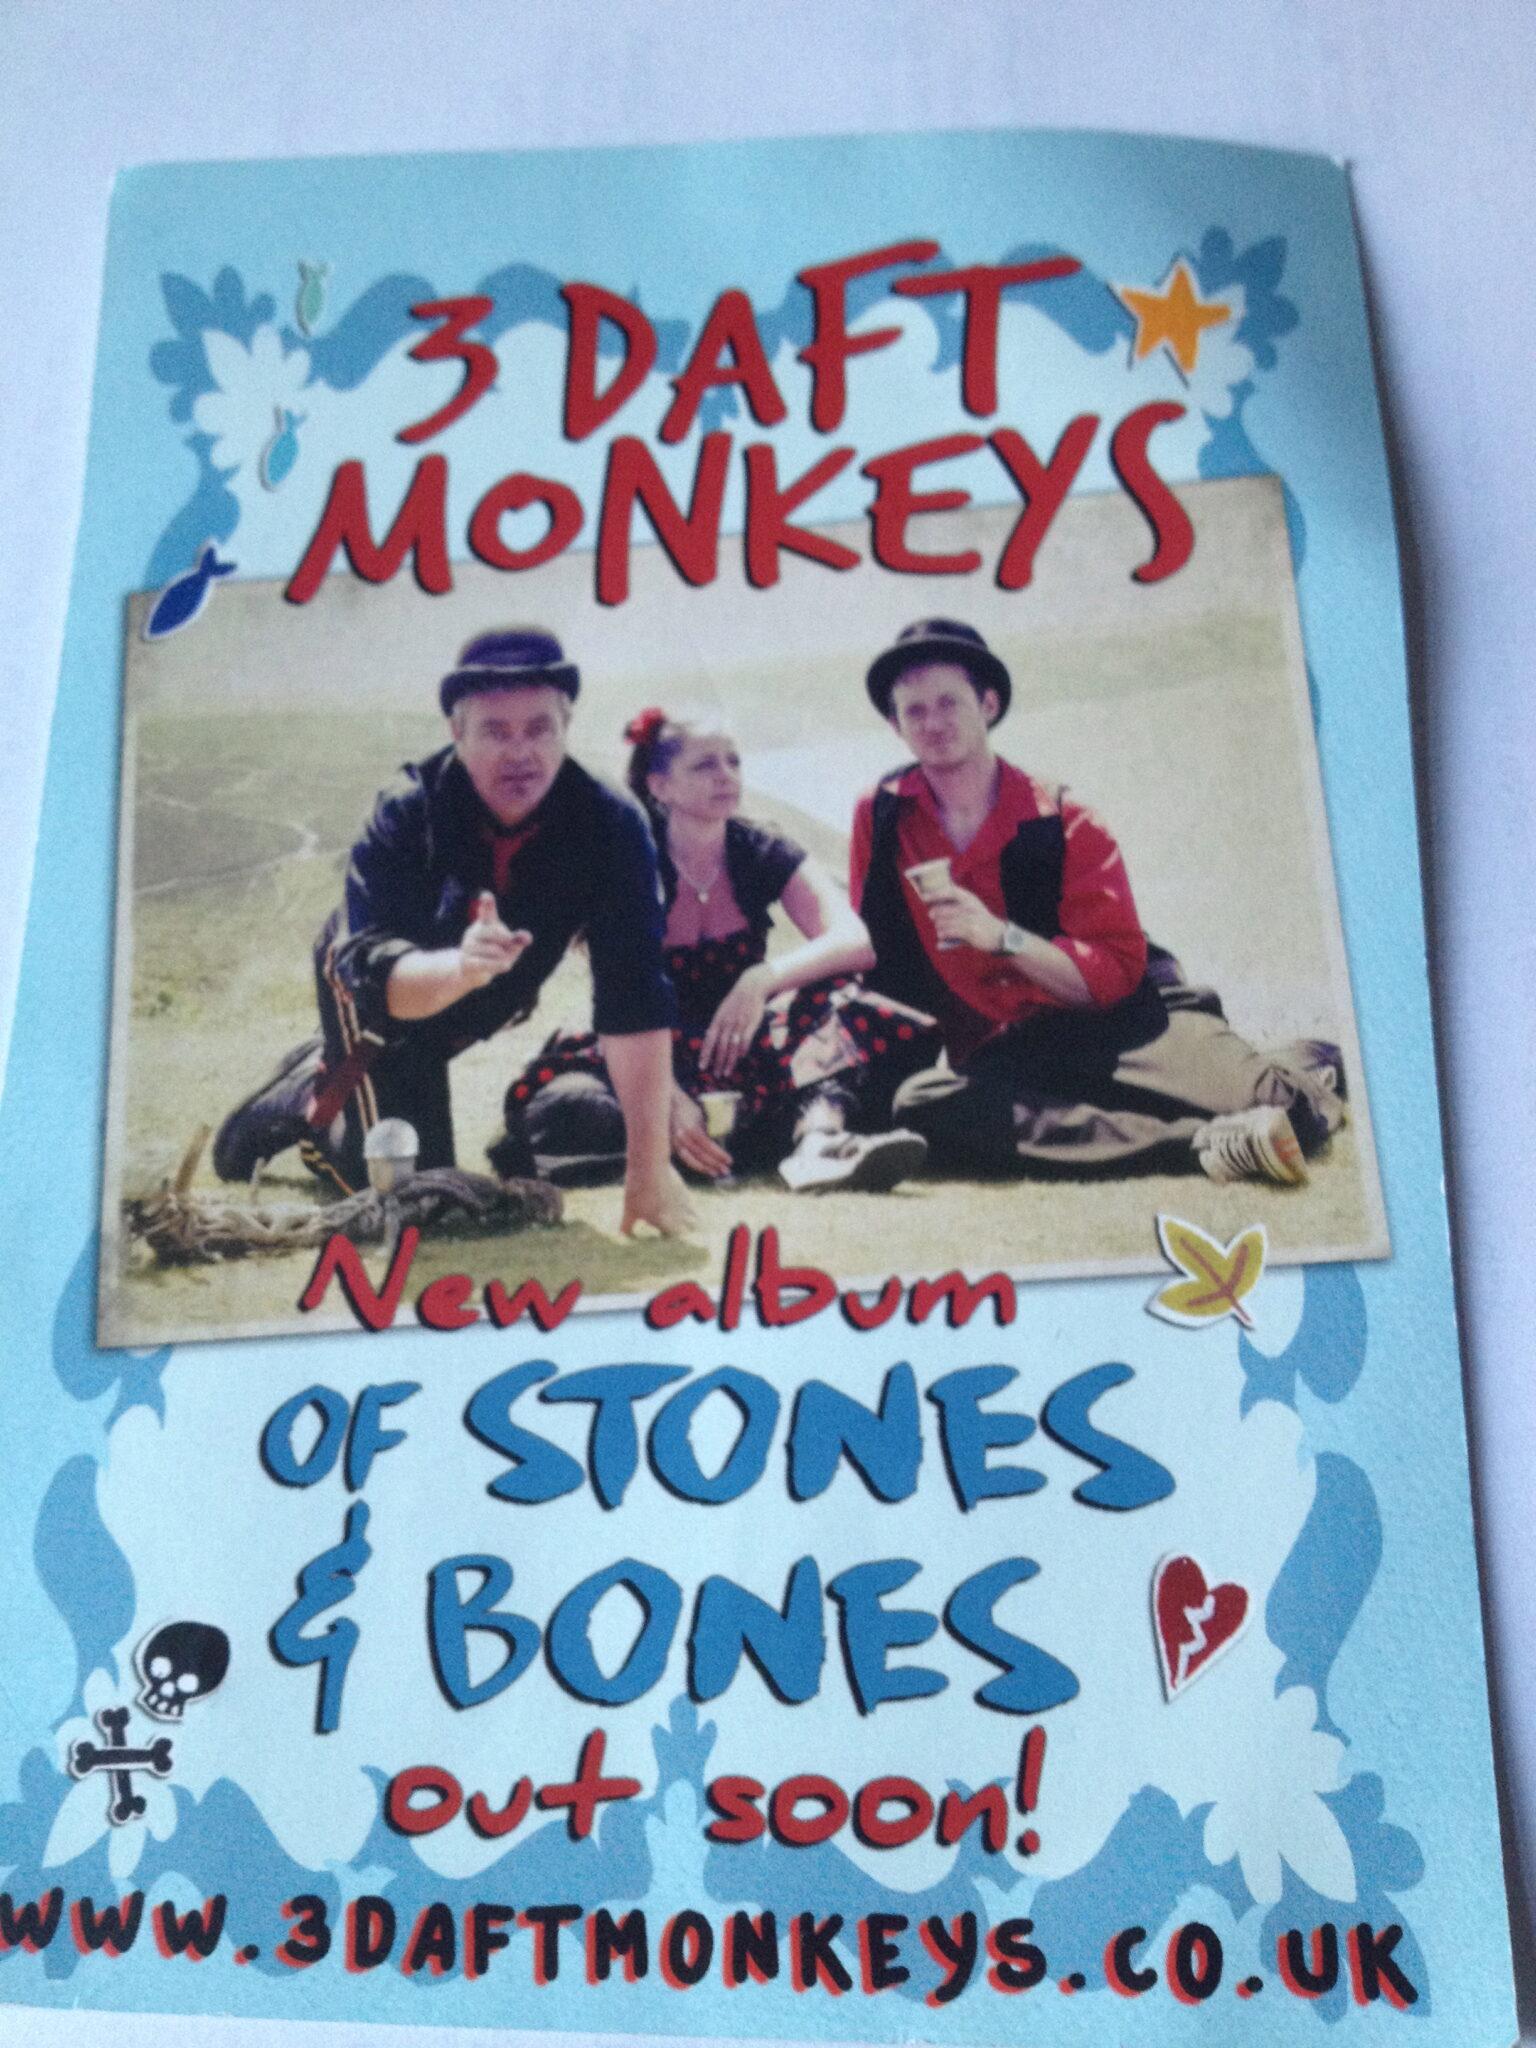 3 Daft Monkeys flyer